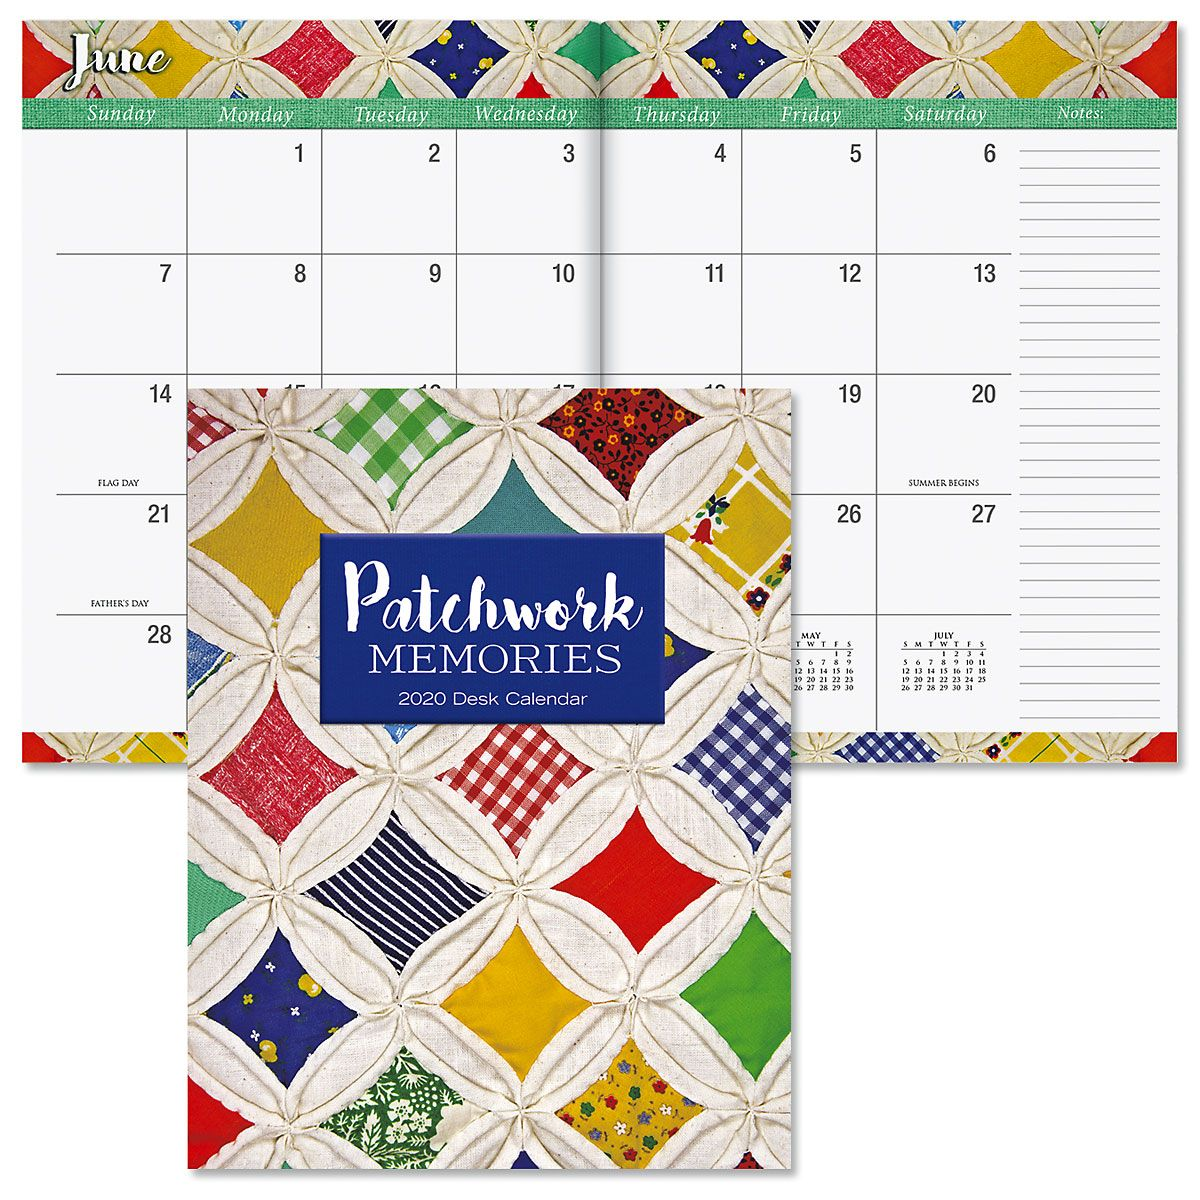 2020 Patchwork Memories Desk Calendar